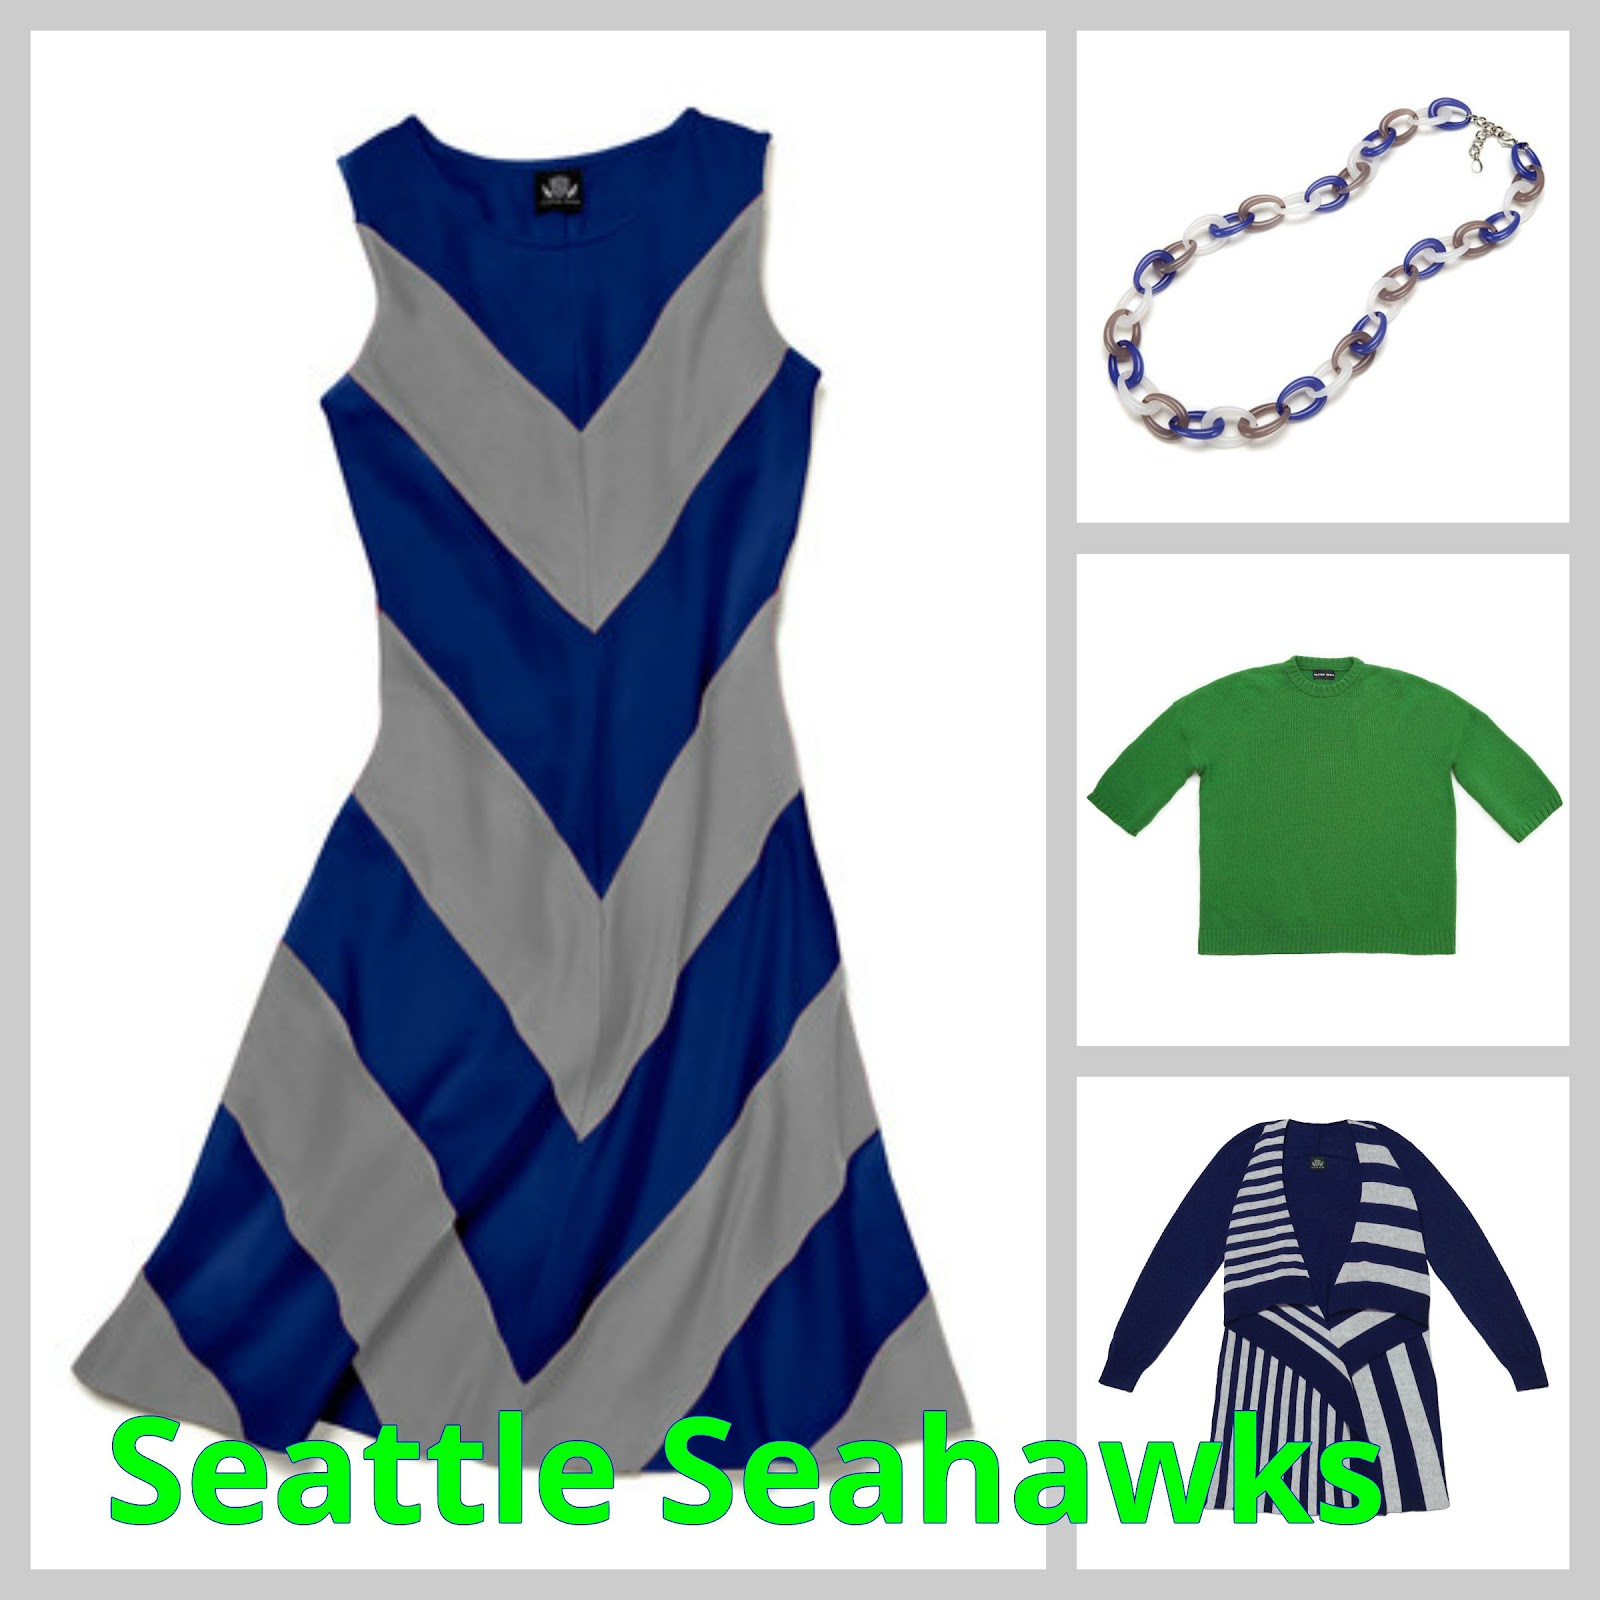 SeattleSeahawks1.jpg